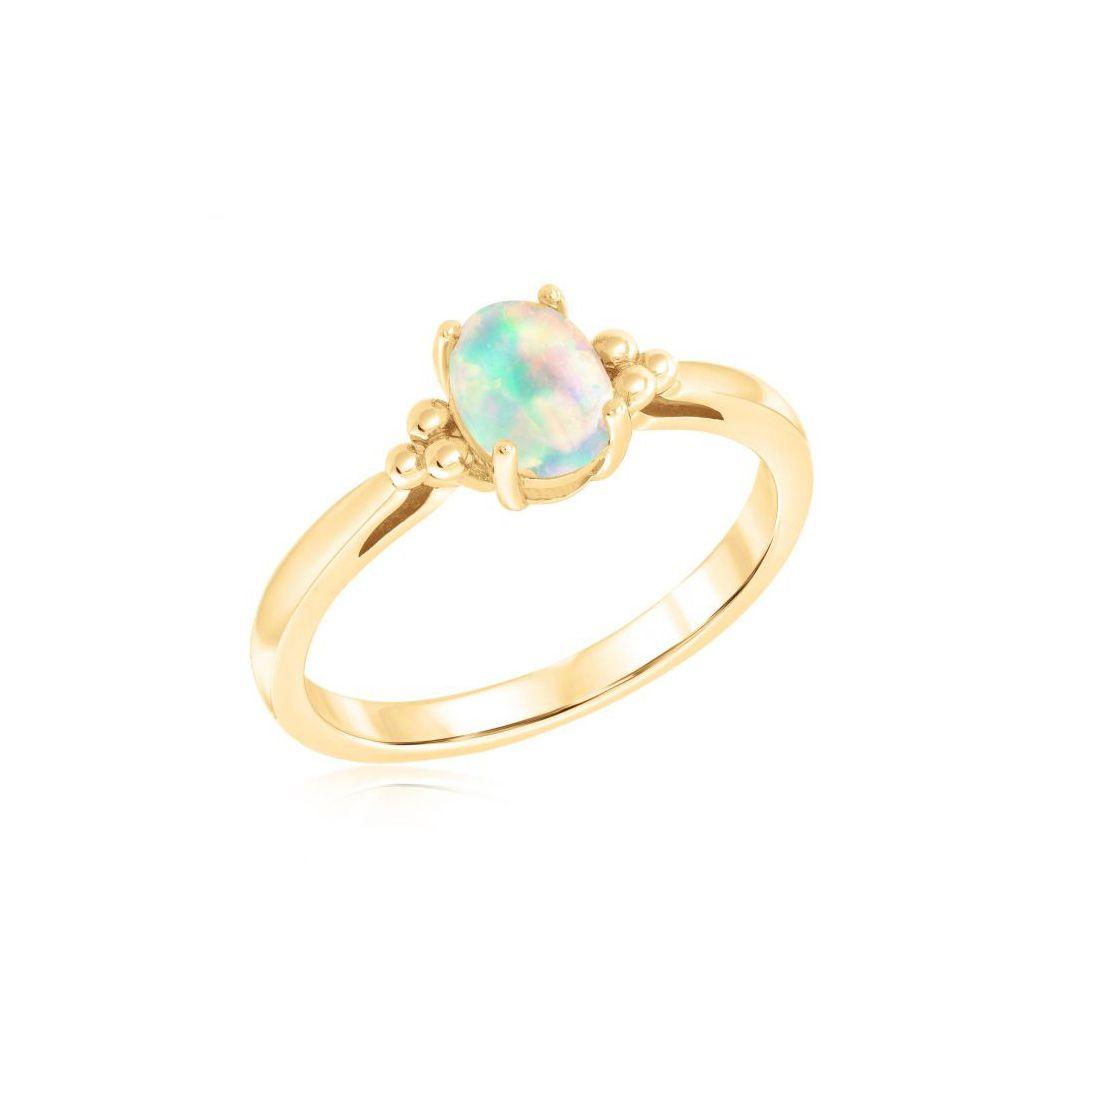 Opal Engagement Rings 70 Beautiful Designs